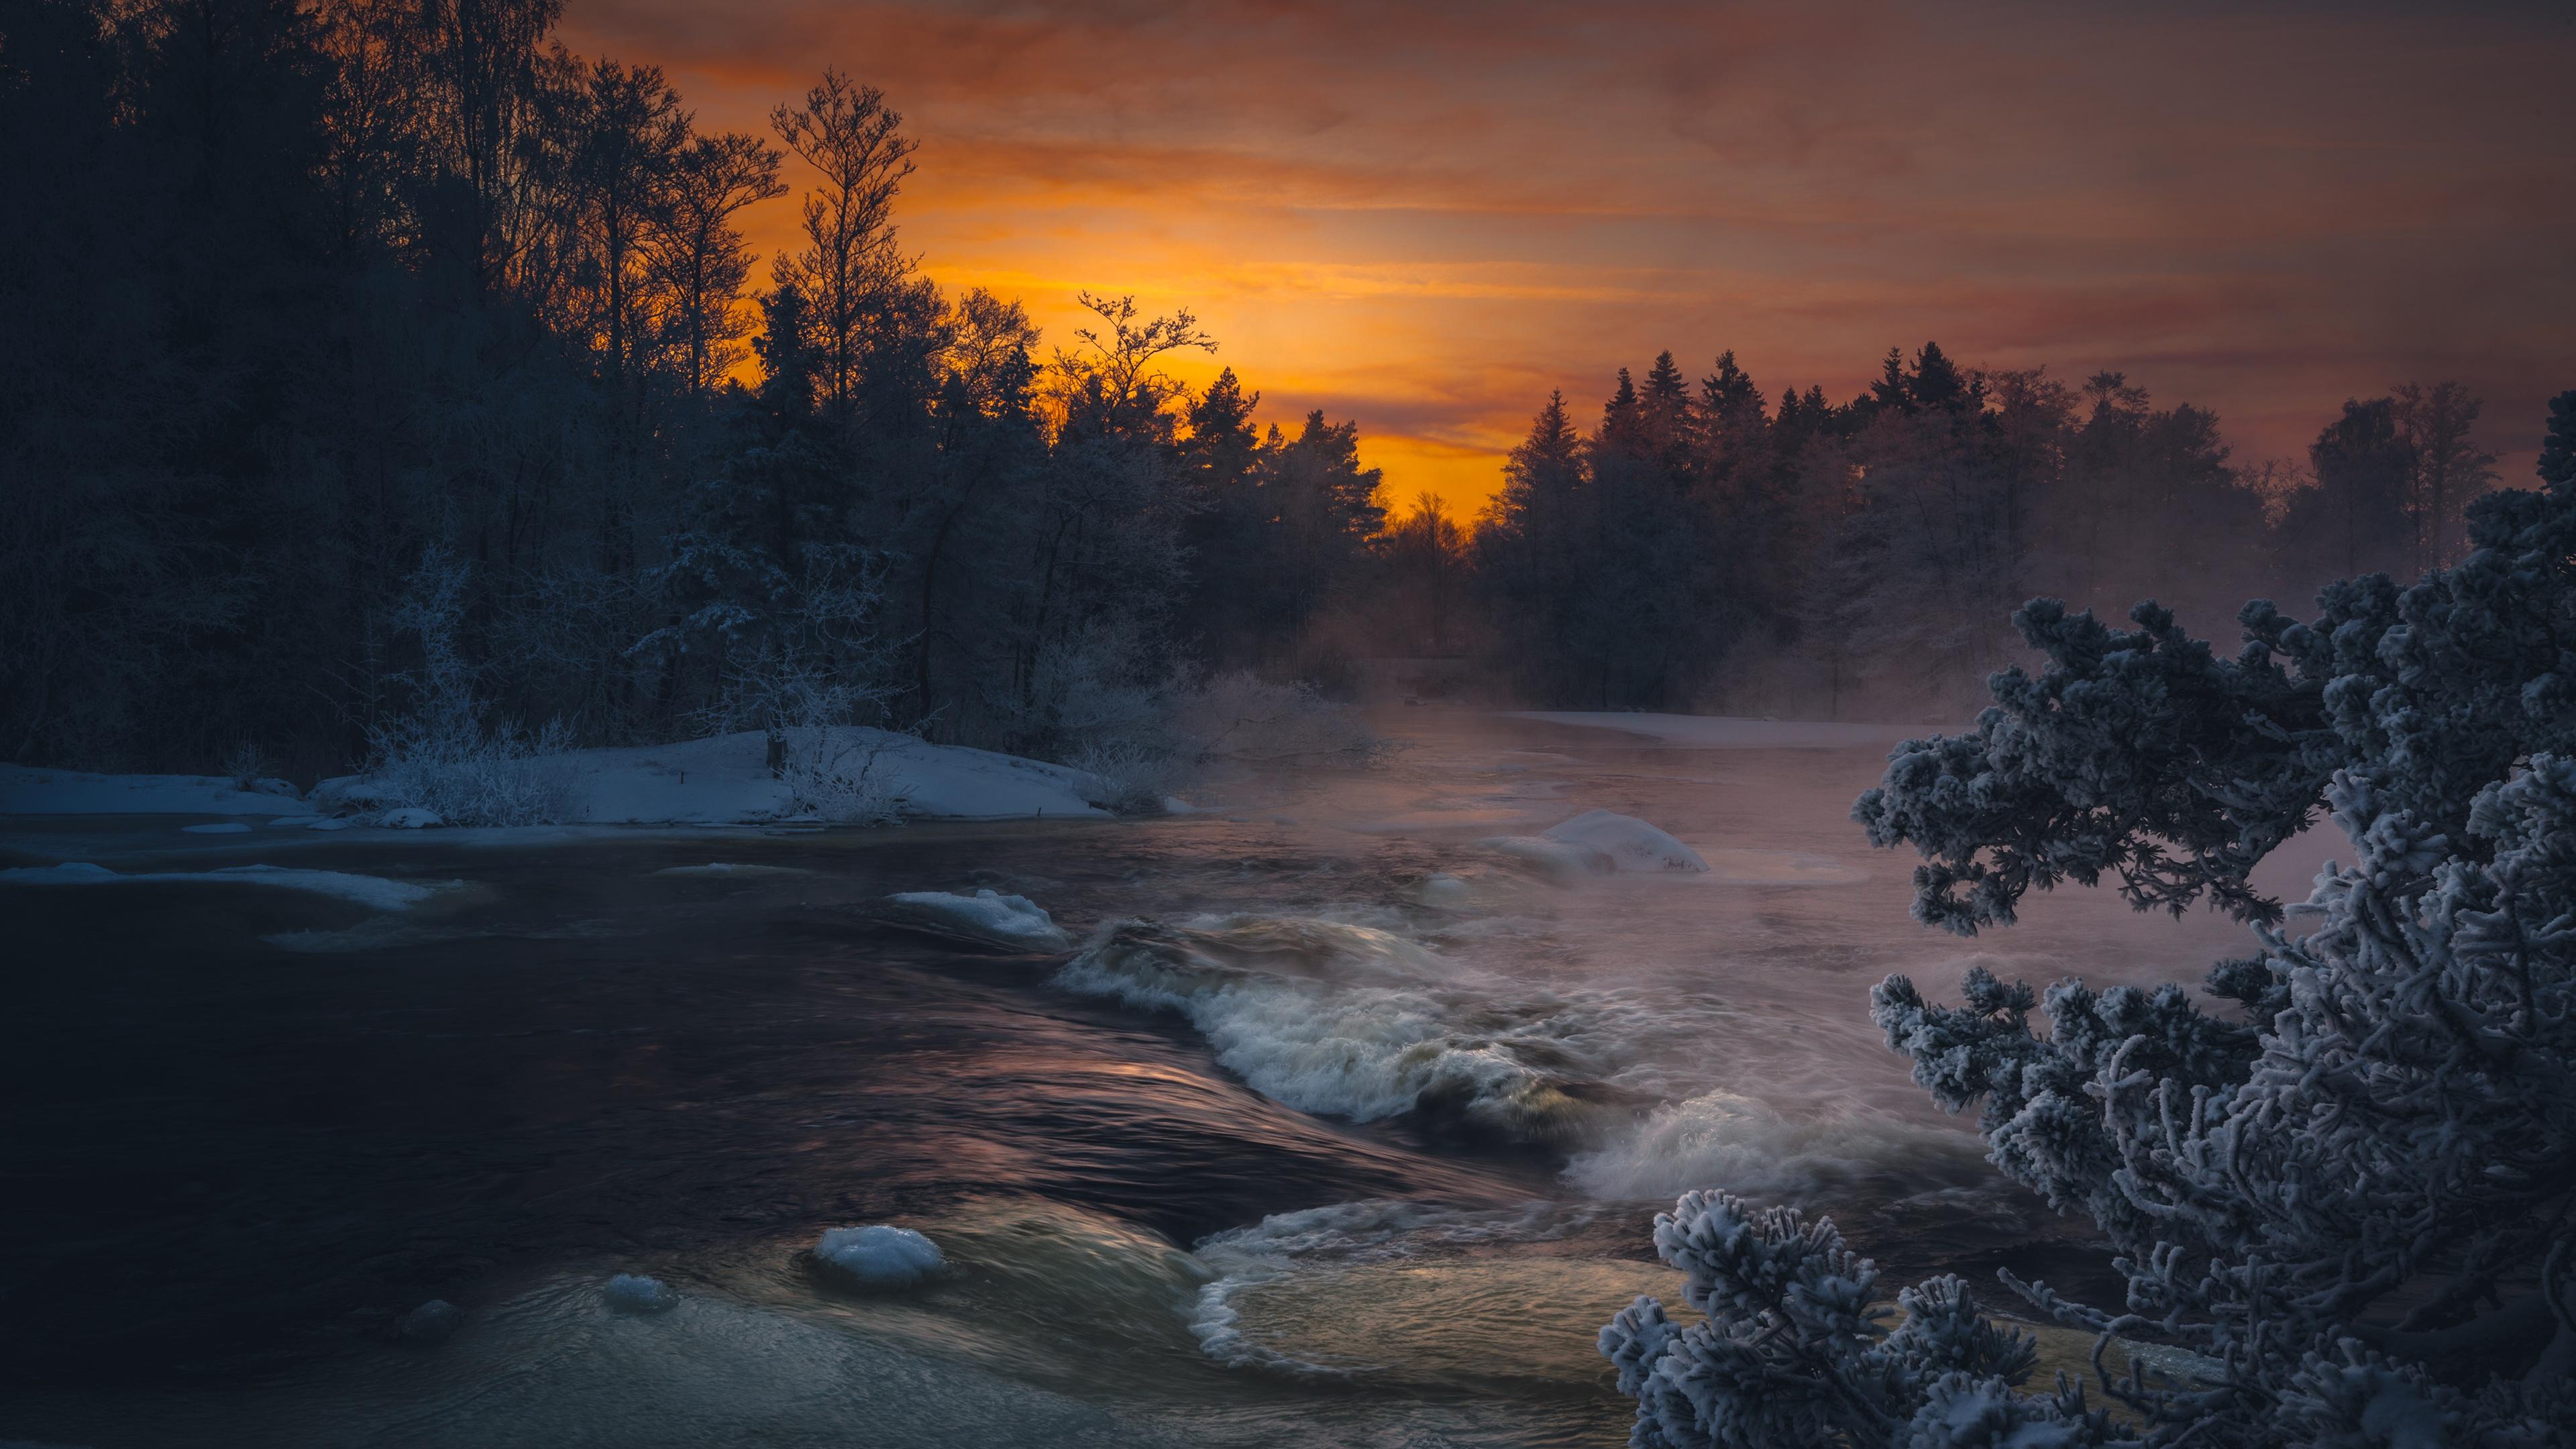 Dark Winter Lake Sunlight 4k, HD Nature, 4k Wallpapers ...